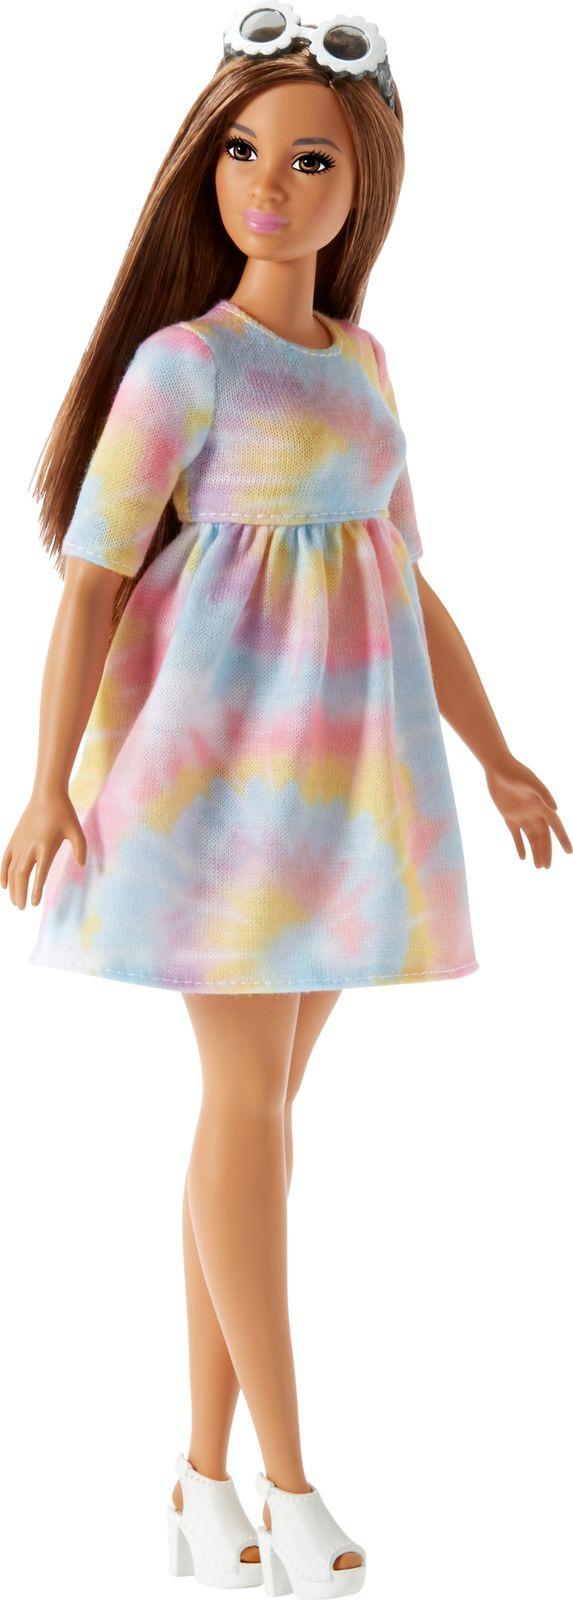 Barbie Кукла Fashionistas № 77